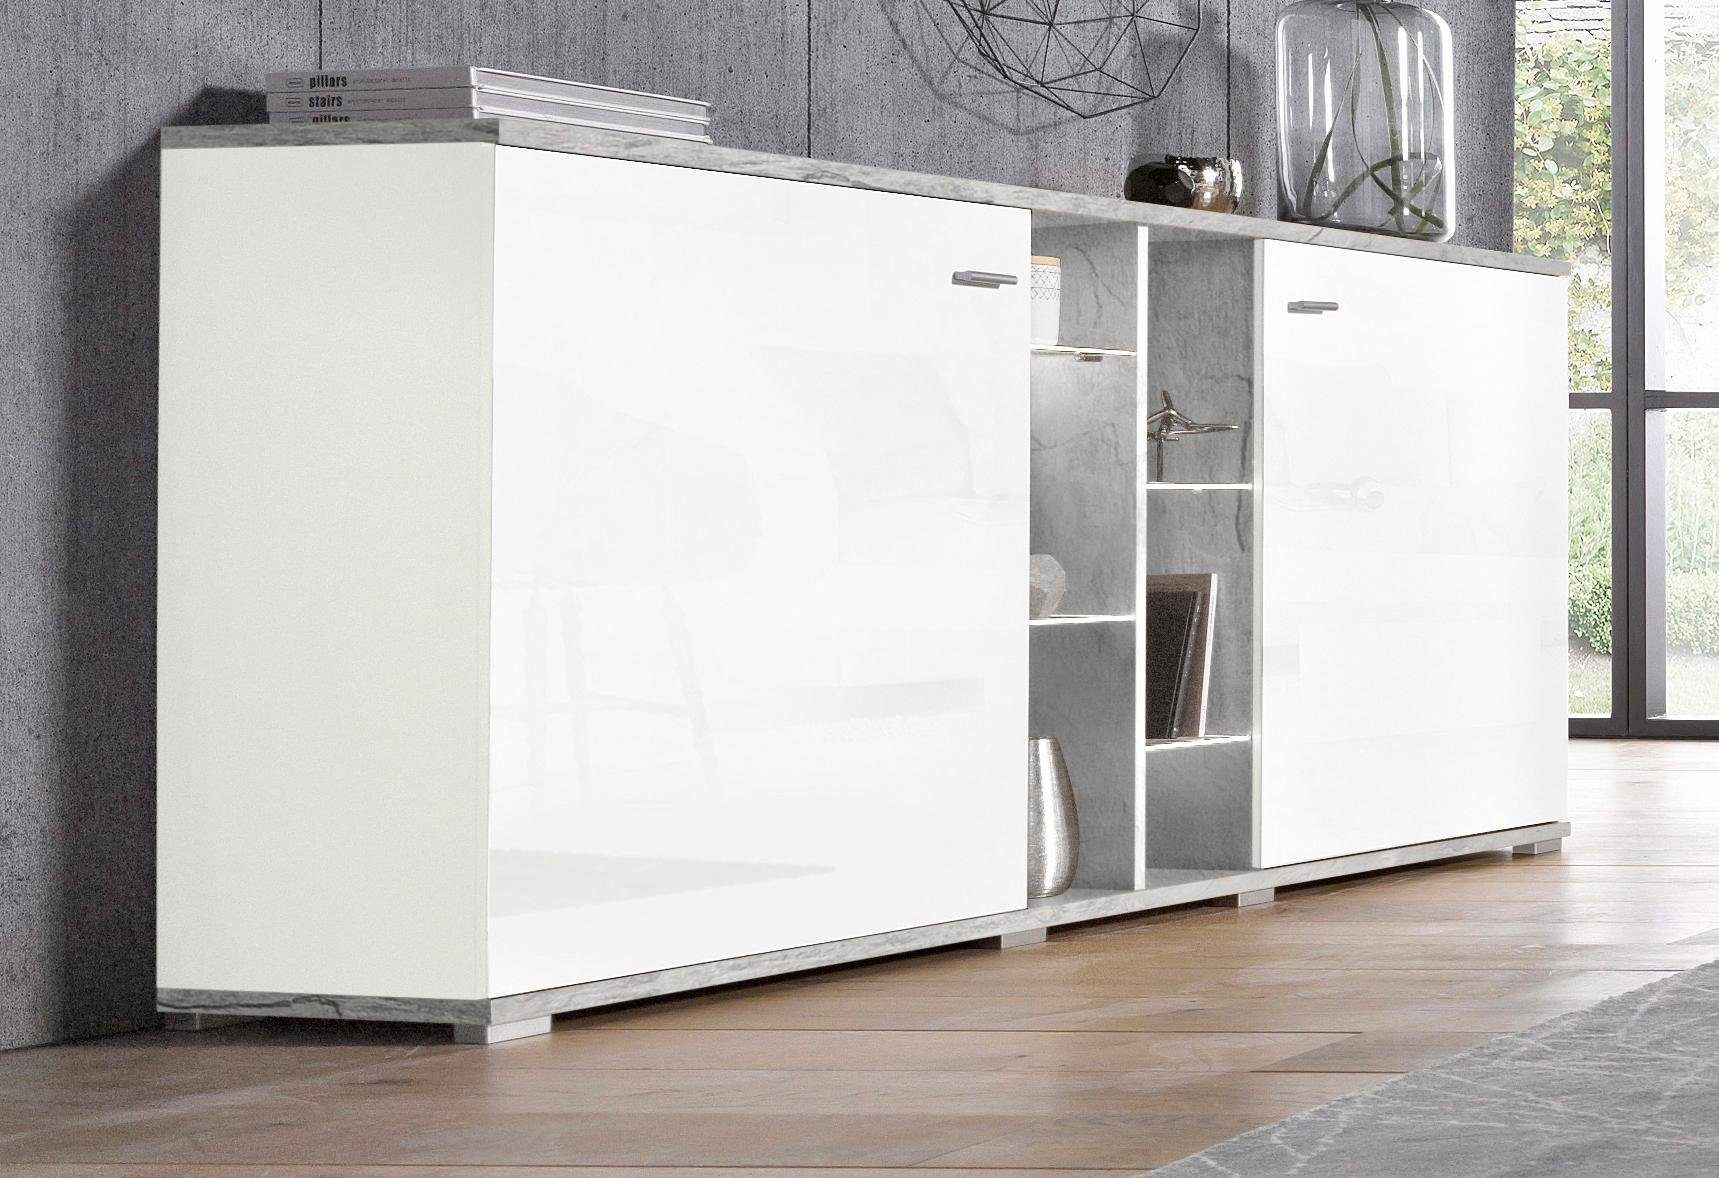 Sideboard Weiß, Pflegeleichte Oberfläche, Hochglanz Fronten,  FSC® Zertifiziert, Yourhome